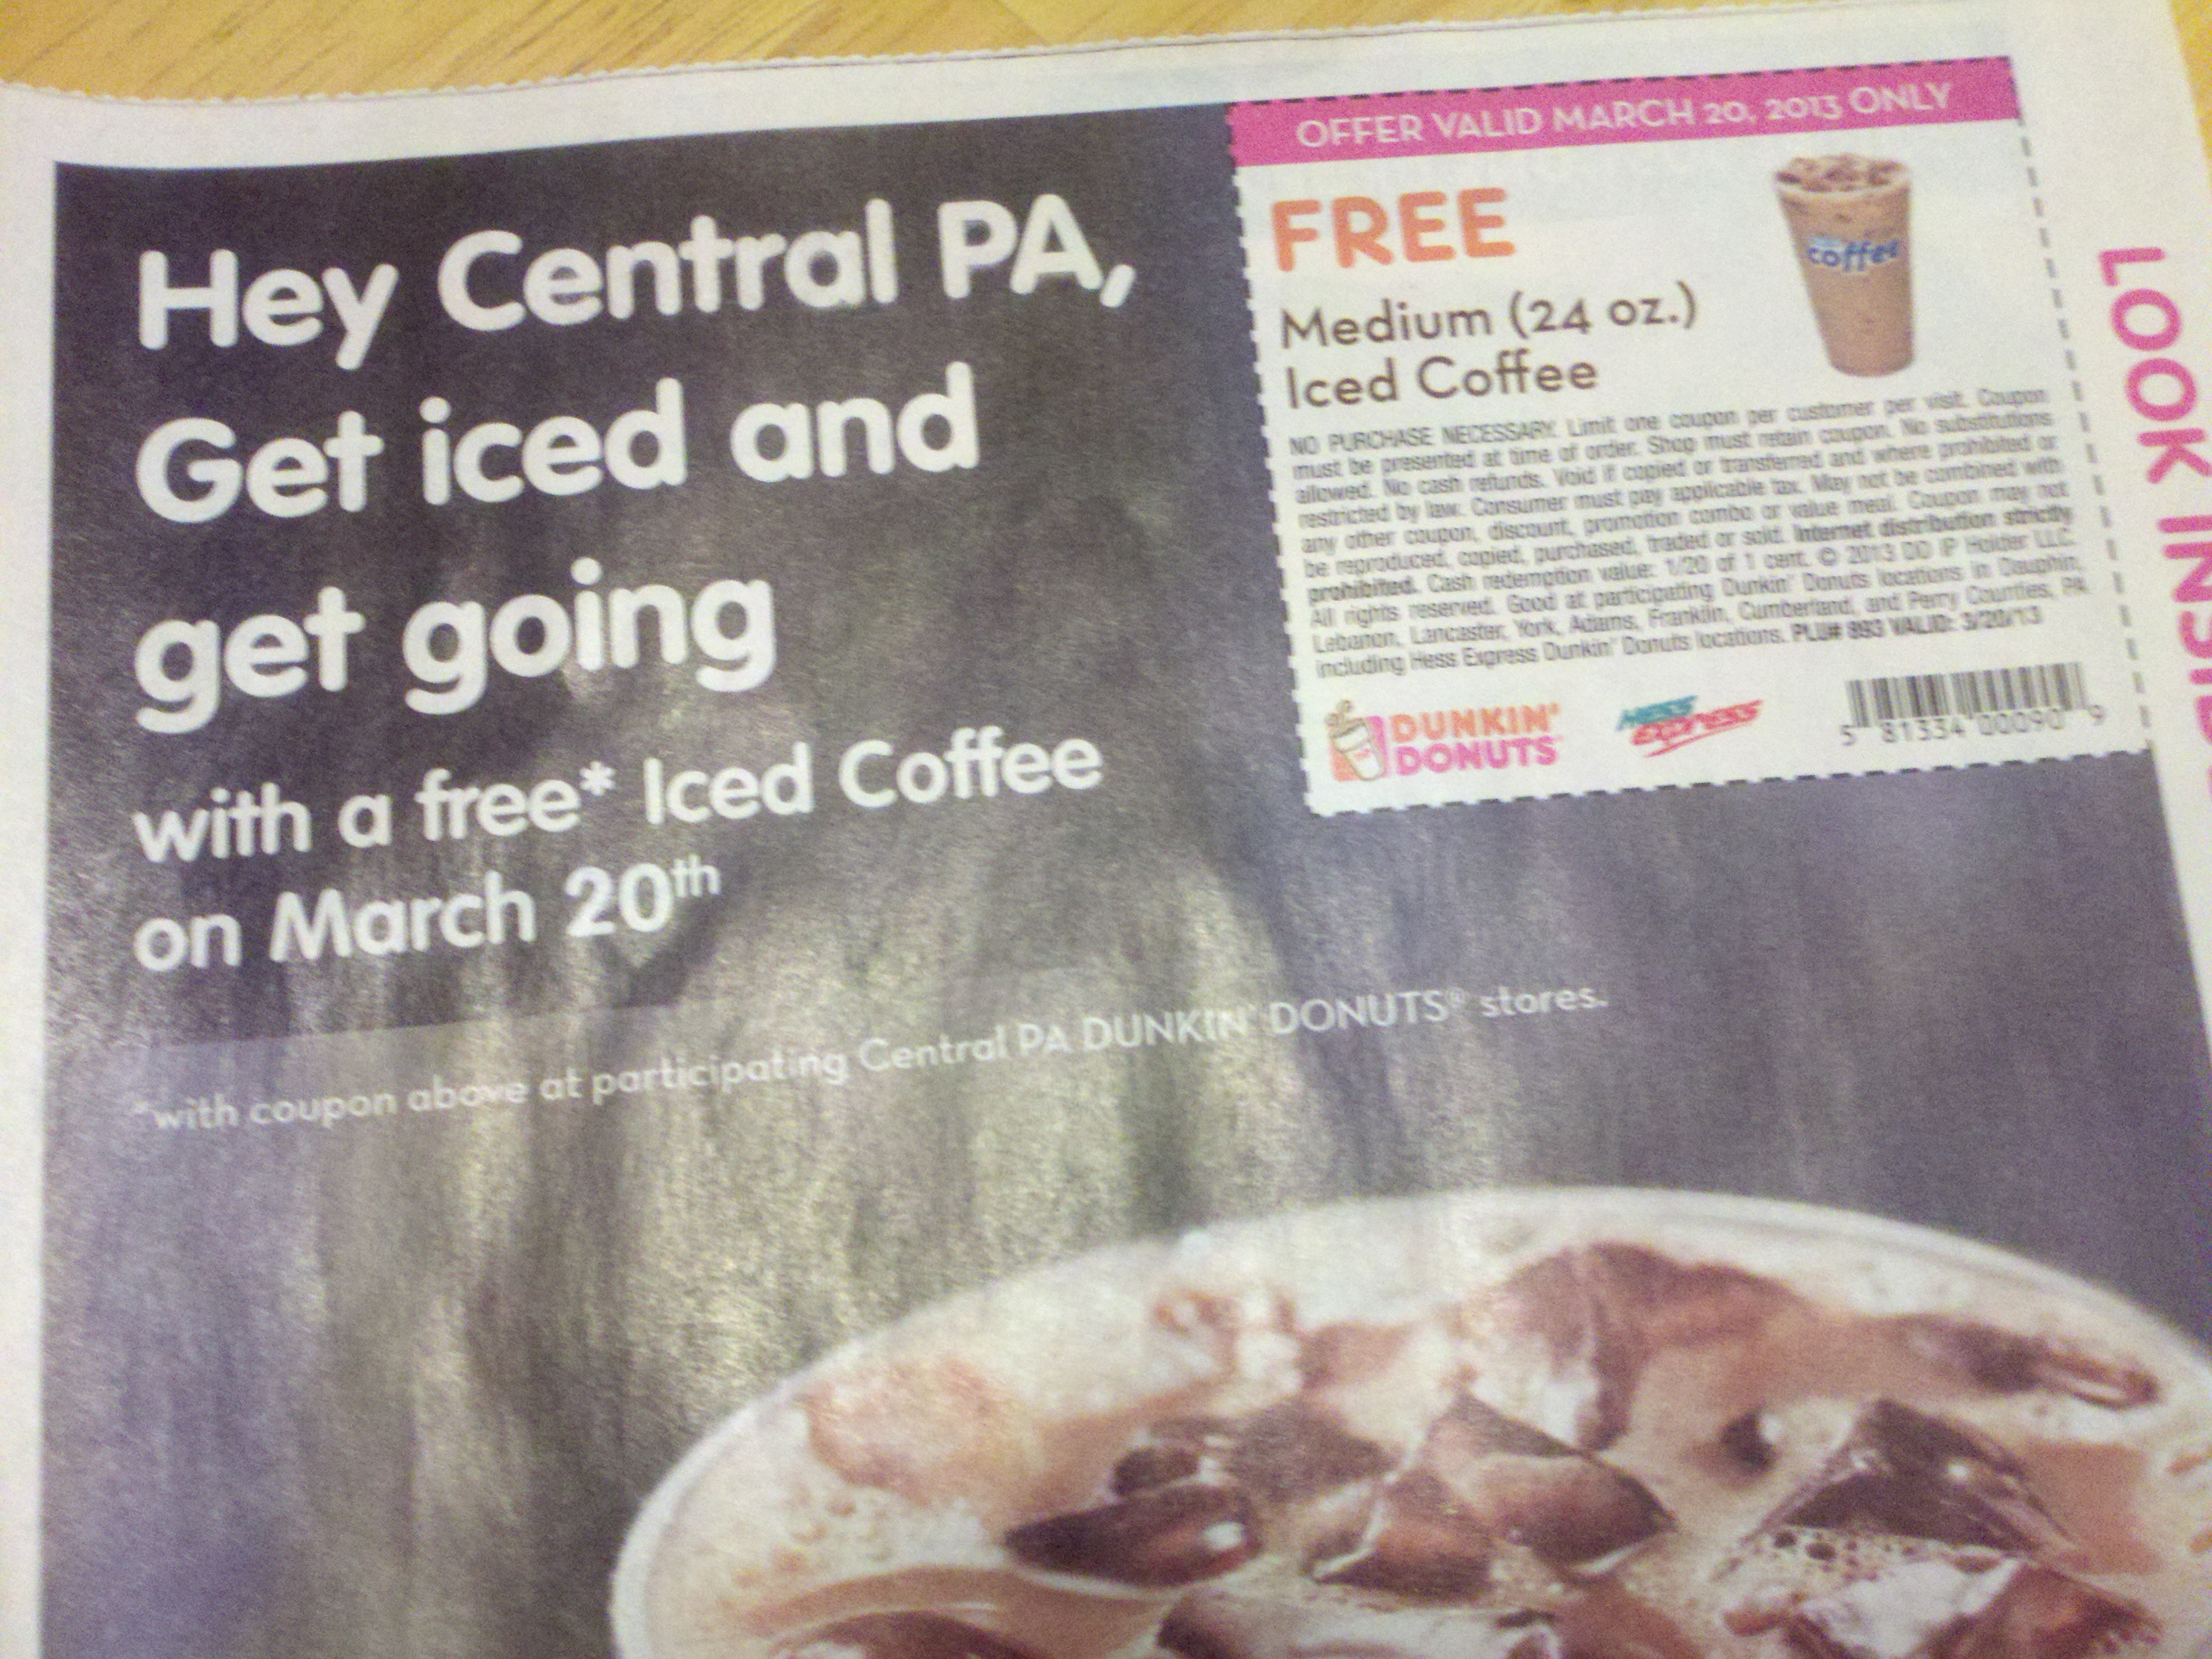 FREE Medium Iced Coffee on March 20, 2013